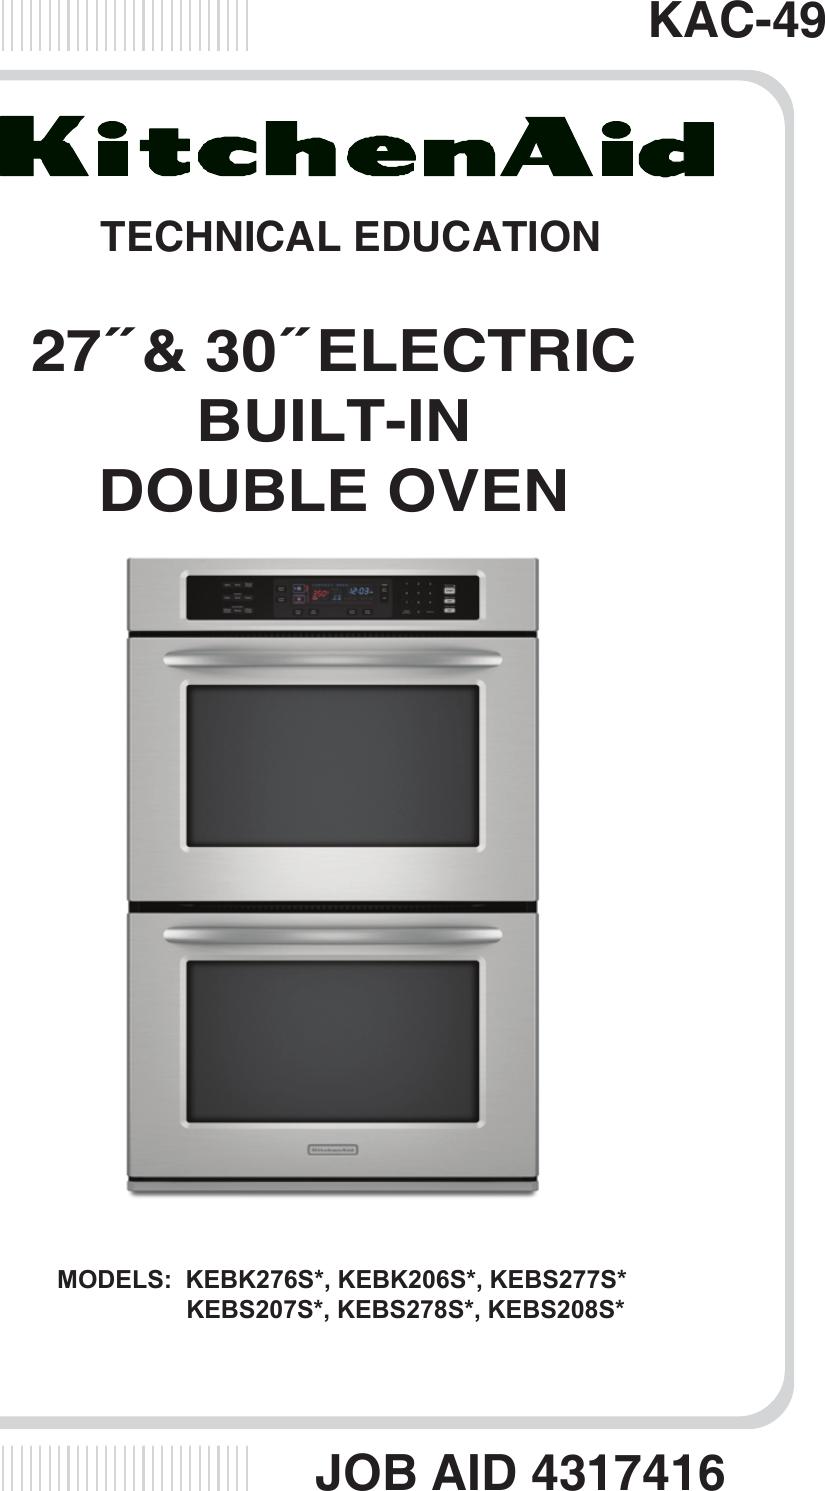 4317416 kitchen aid 27 30 inch double oven kac 49 rh usermanual wiki